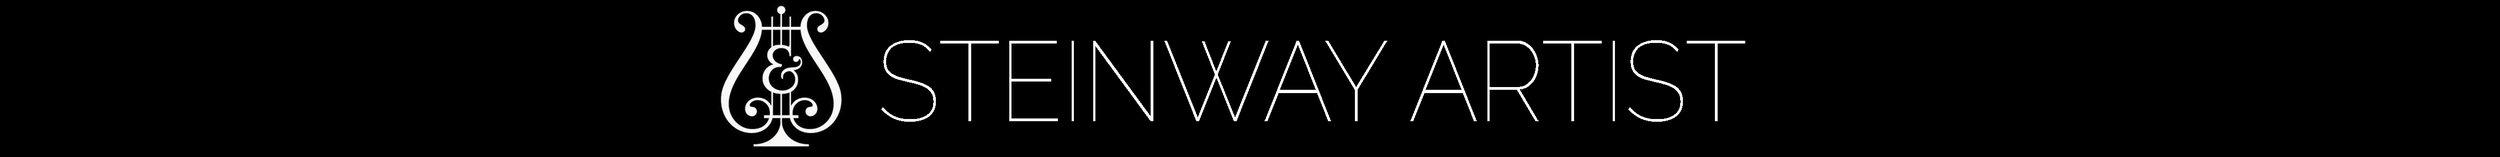 Steinway & Sons Artist copy.jpg